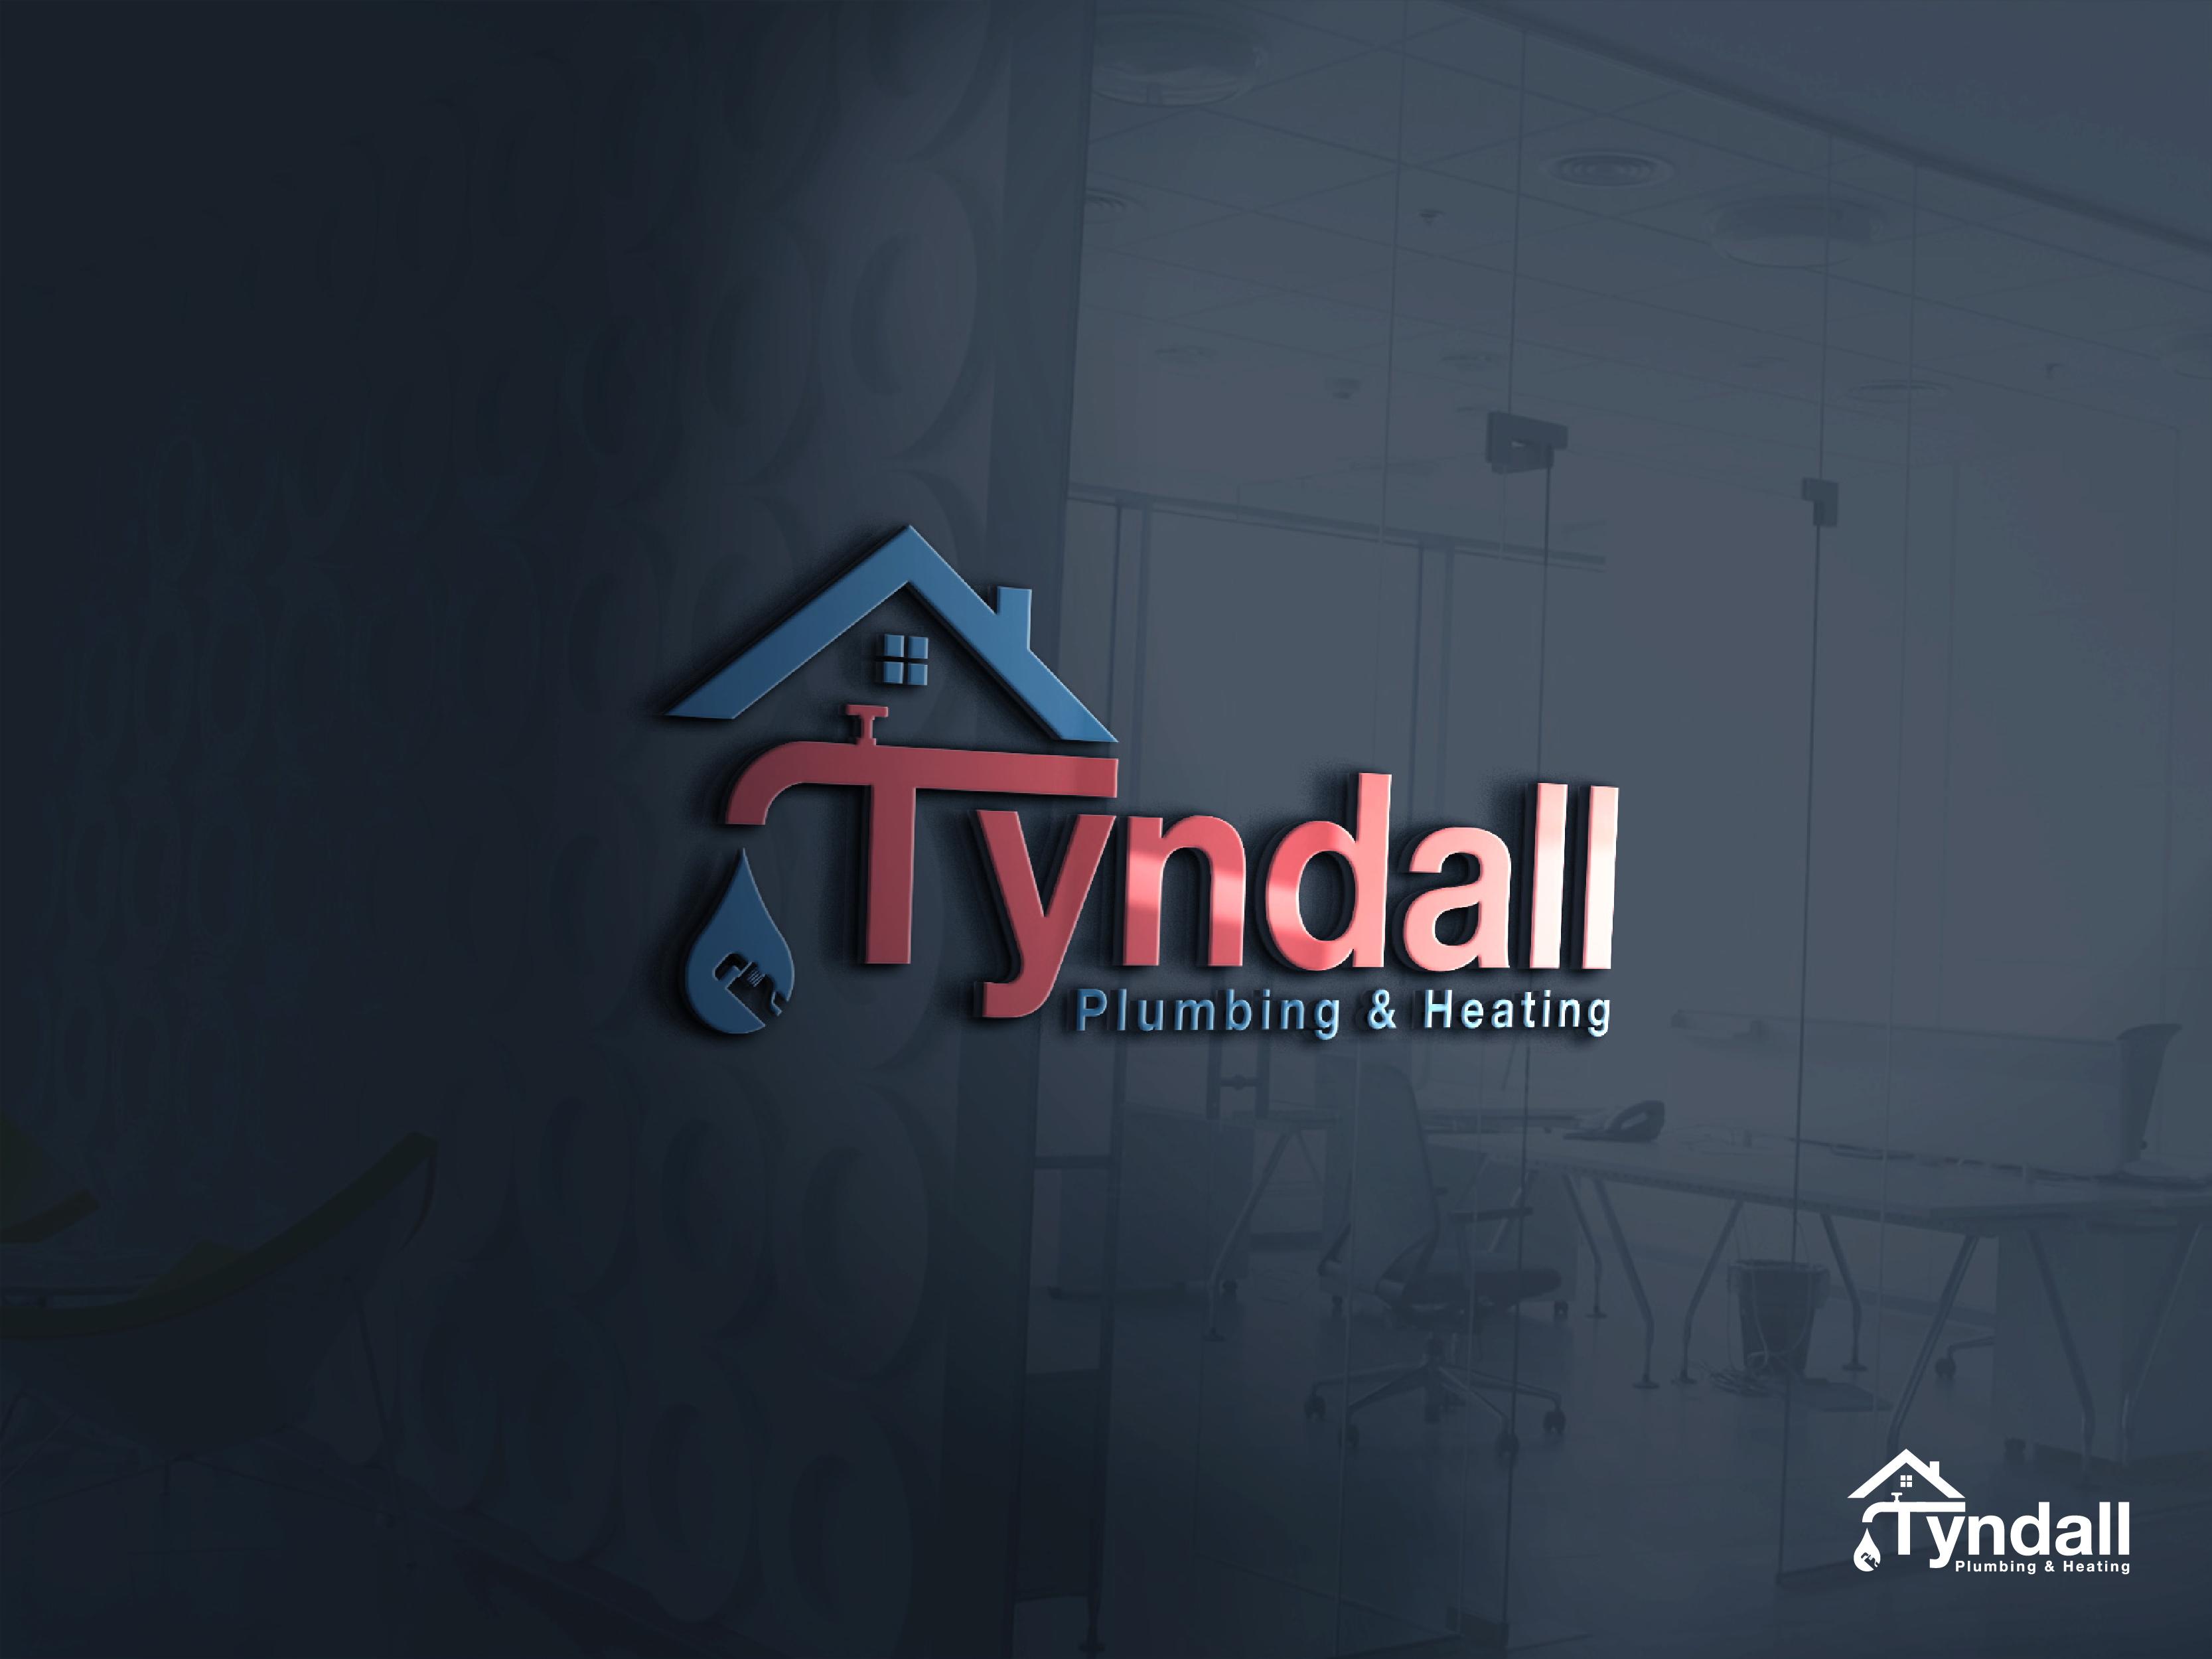 Logo Design by Shivaprasad Sangondimath - Entry No. 77 in the Logo Design Contest Imaginative Logo Design for Tyndall Plumbing & Heating.